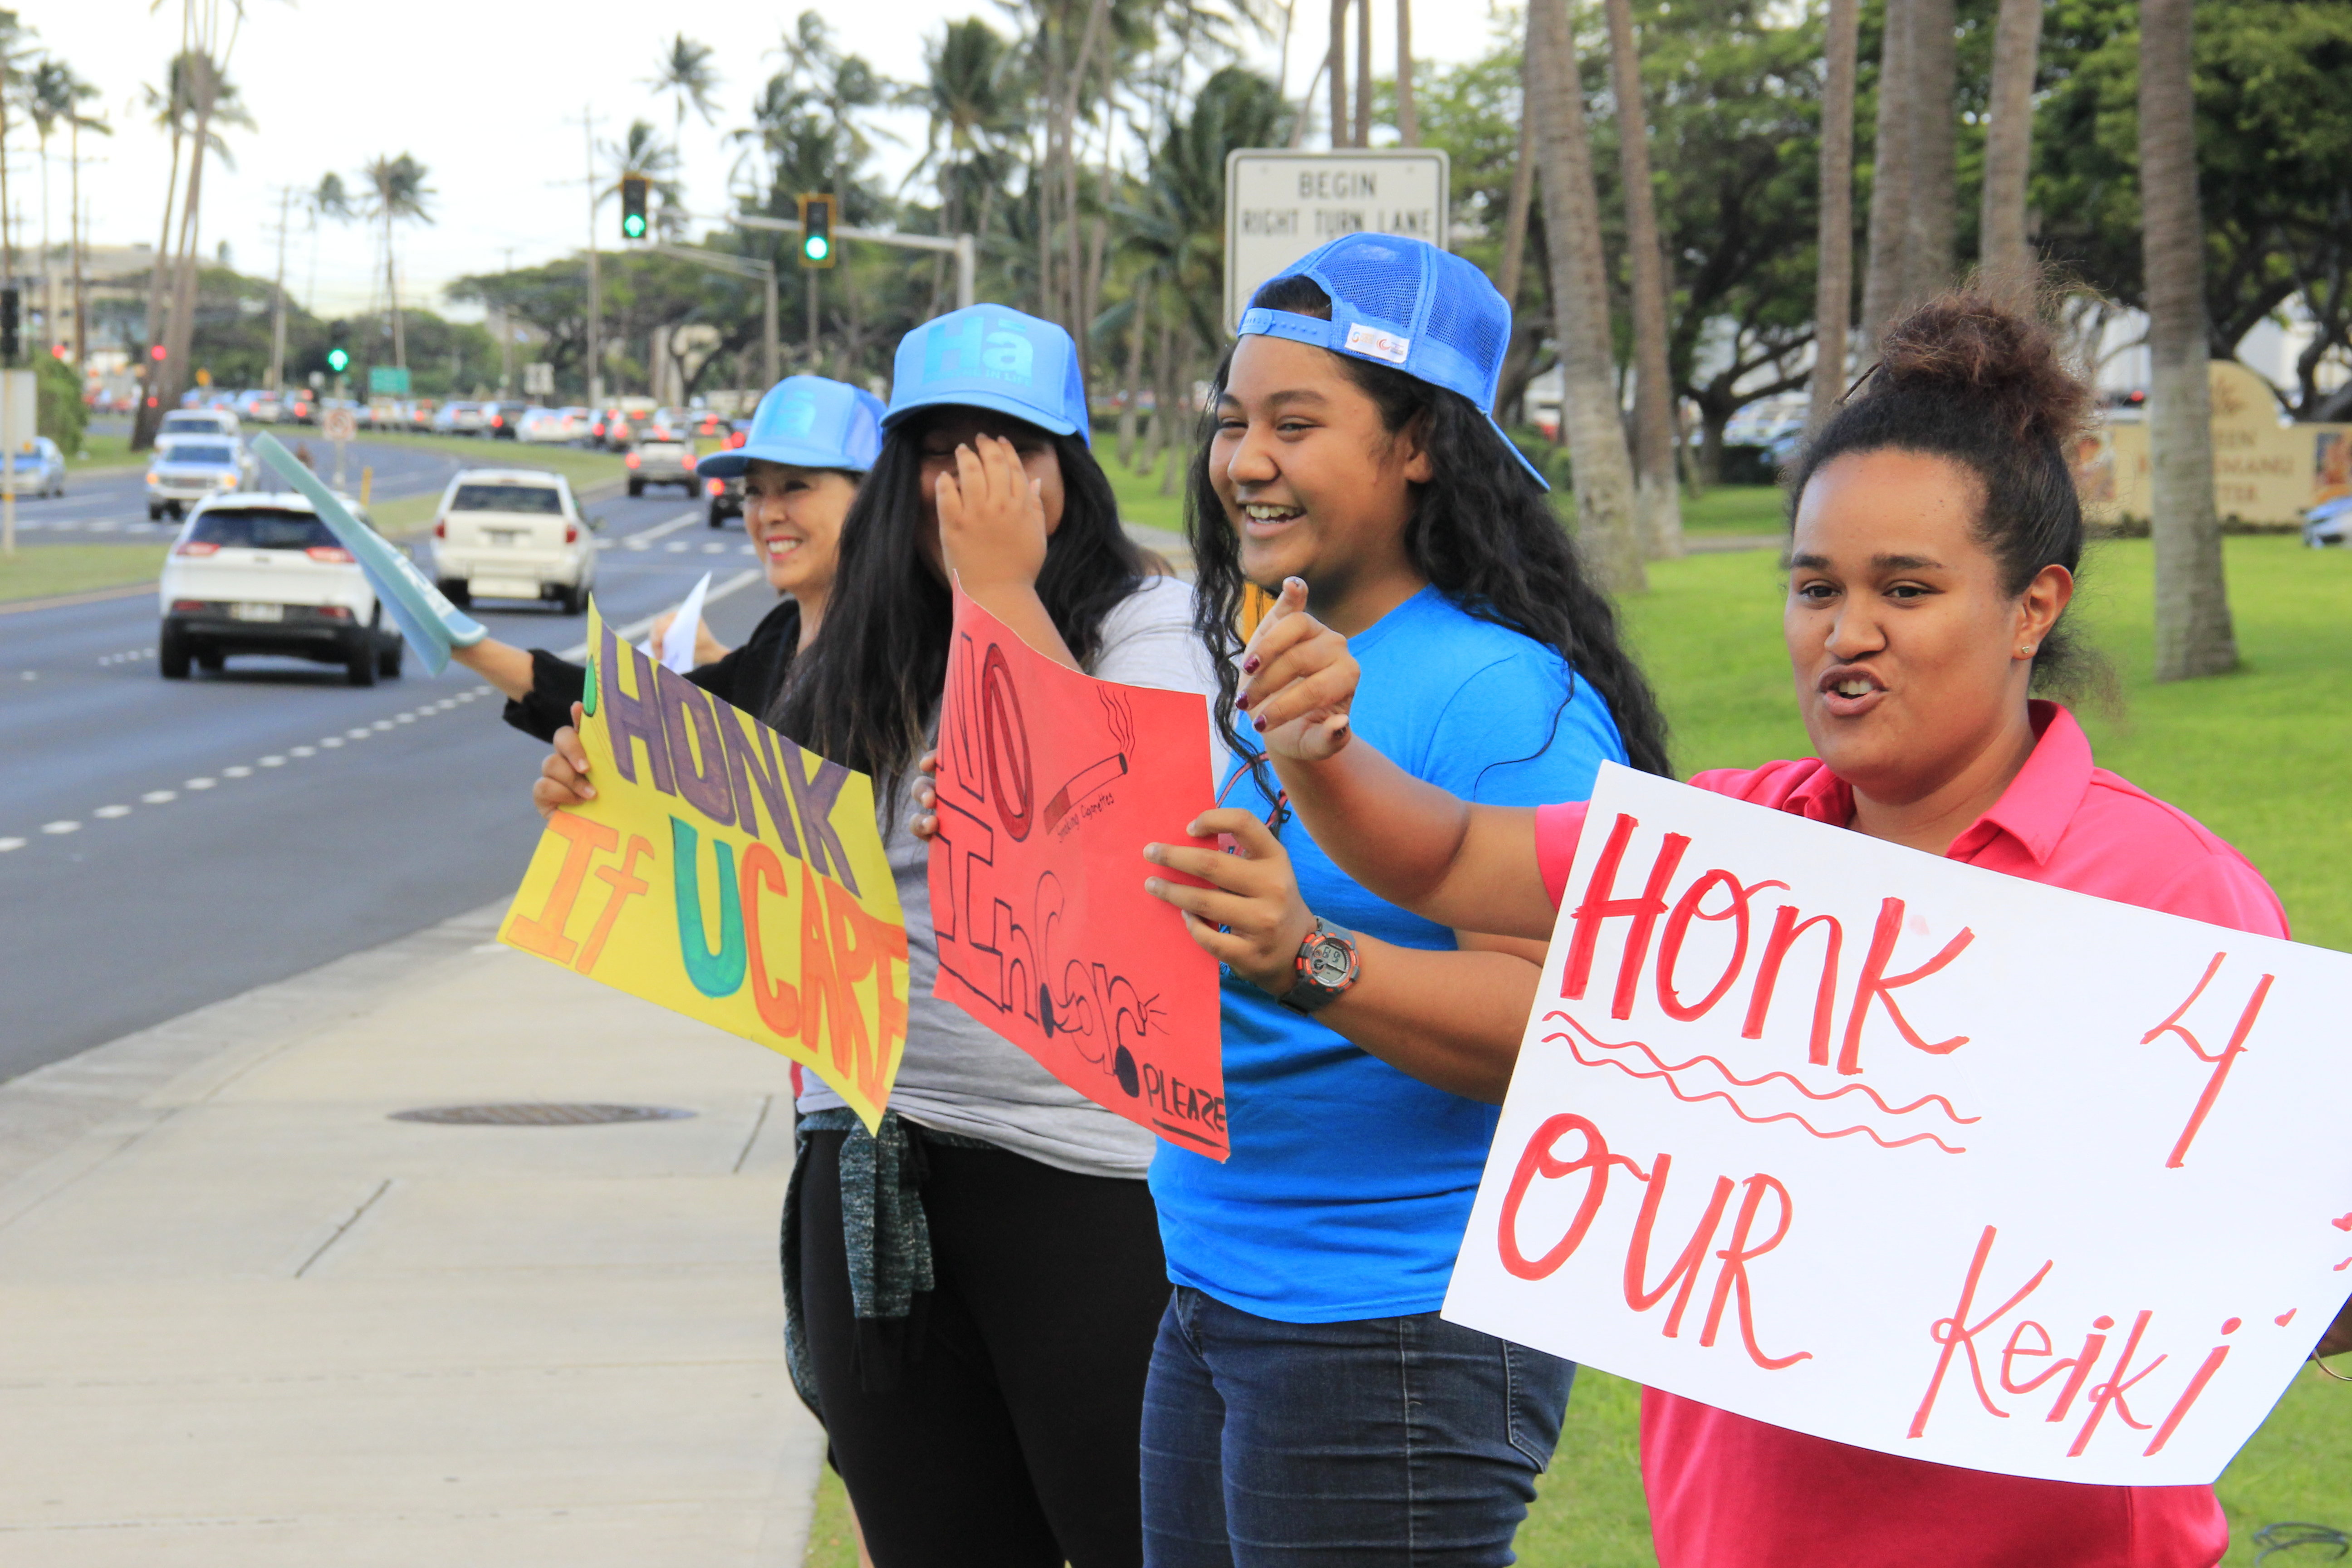 Maui Police to Enforce Traffic Violations in School Zones